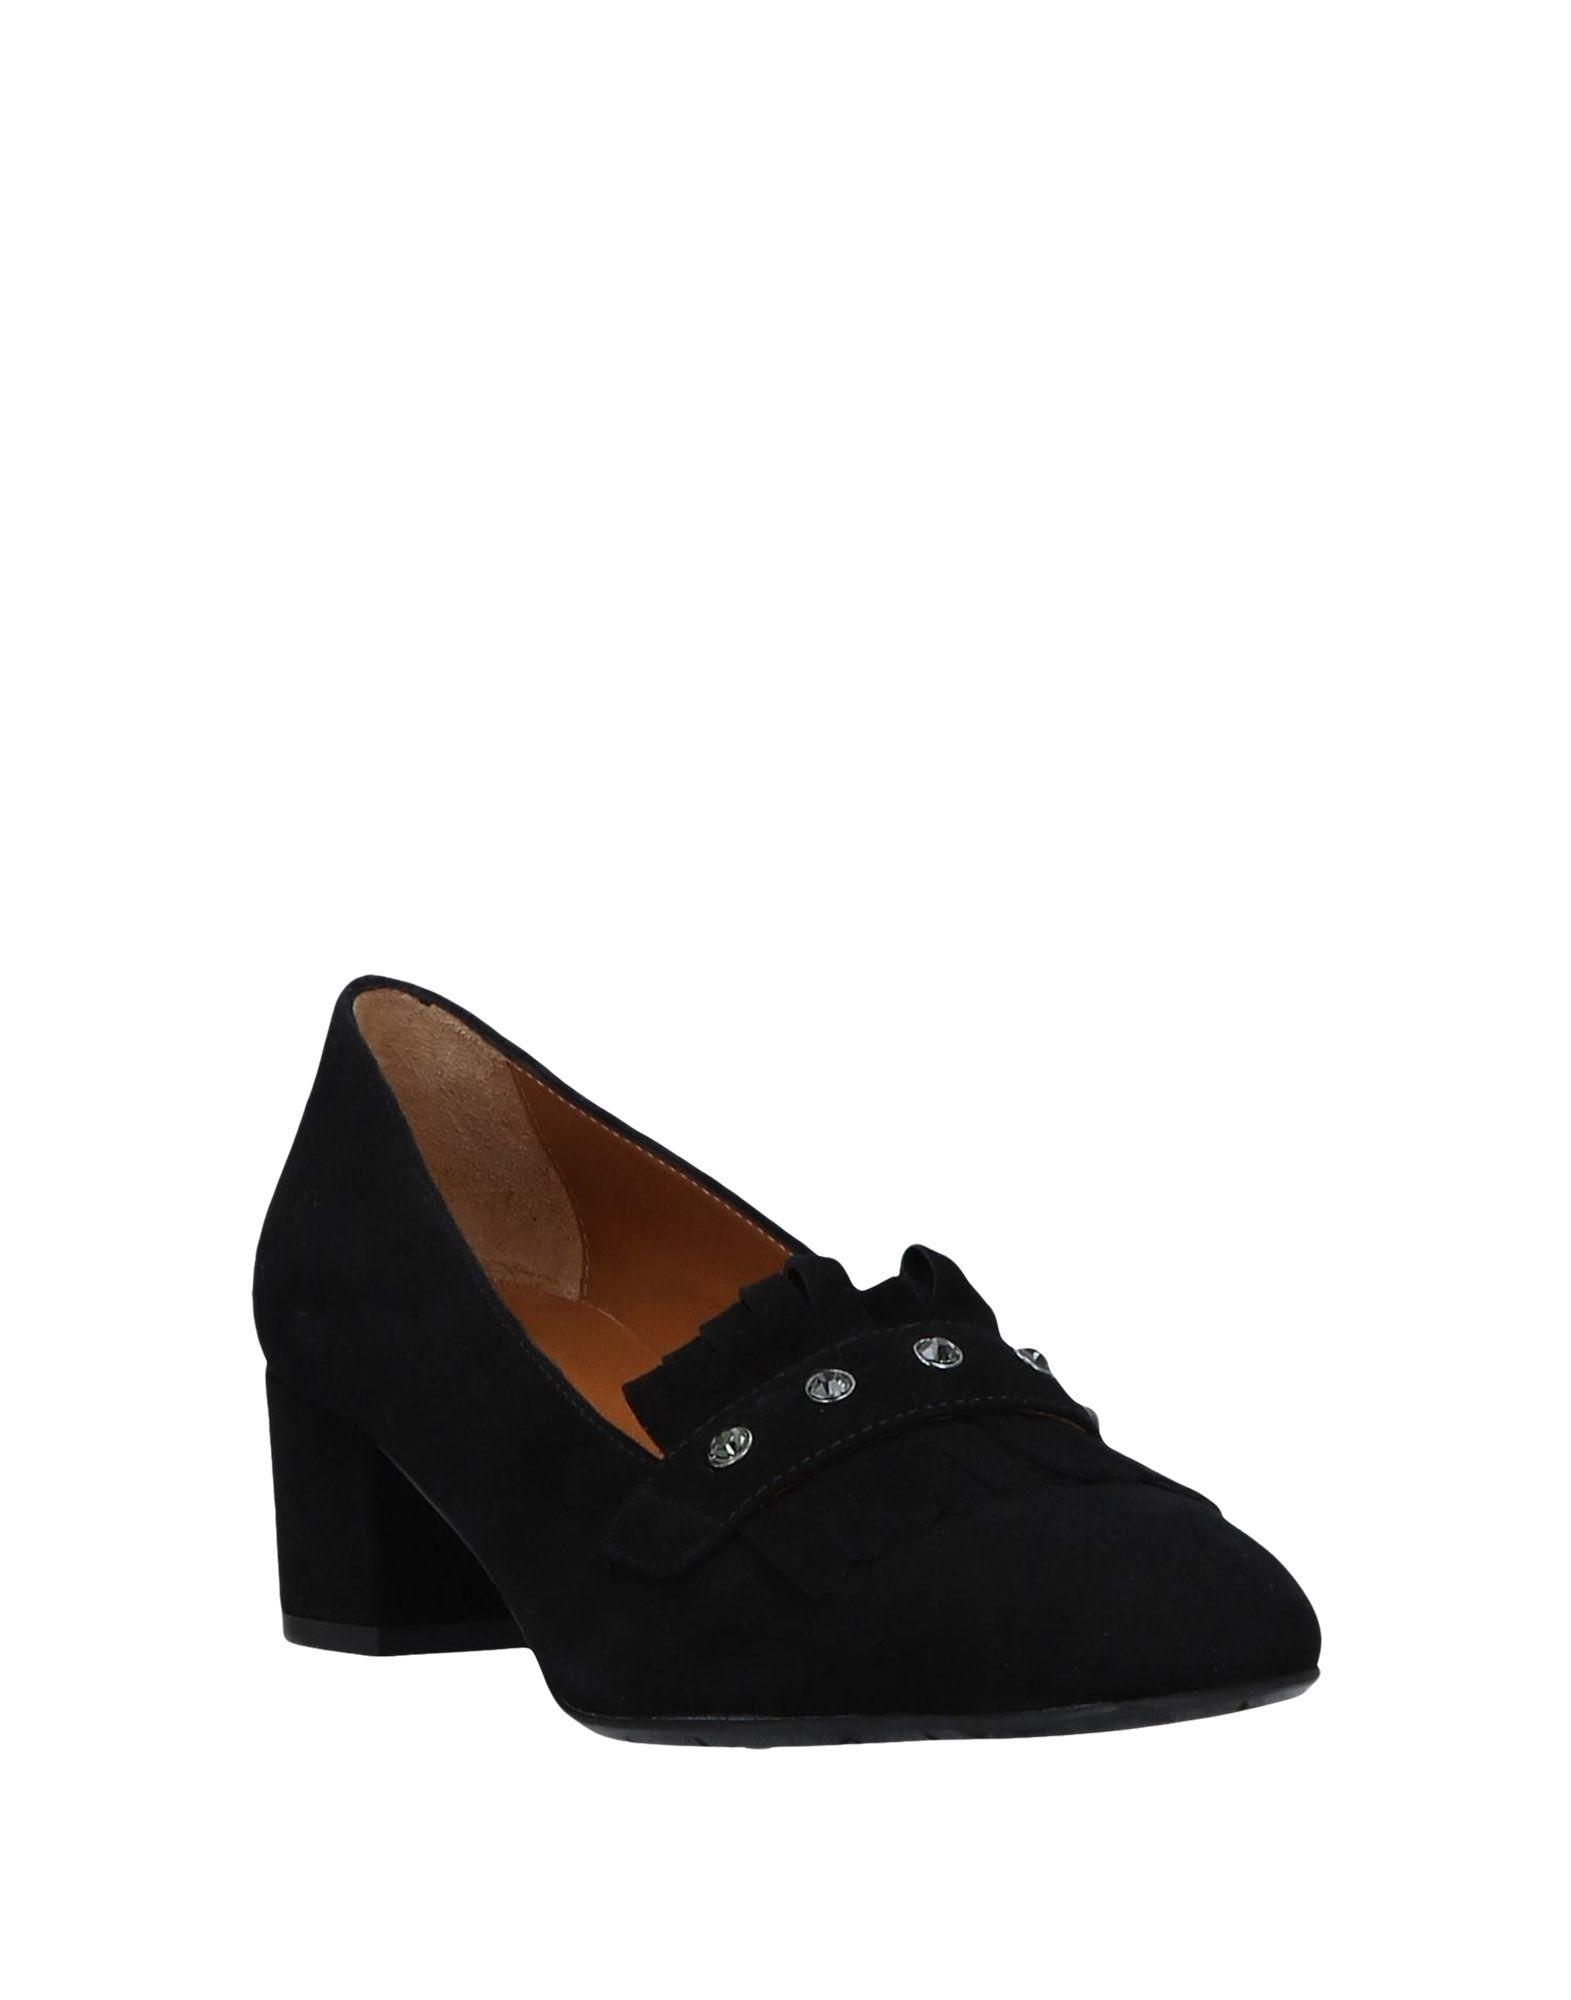 Fratelli Karida Mokassins Damen 11517140FJ  11517140FJ Damen Gute Qualität beliebte Schuhe b6870f